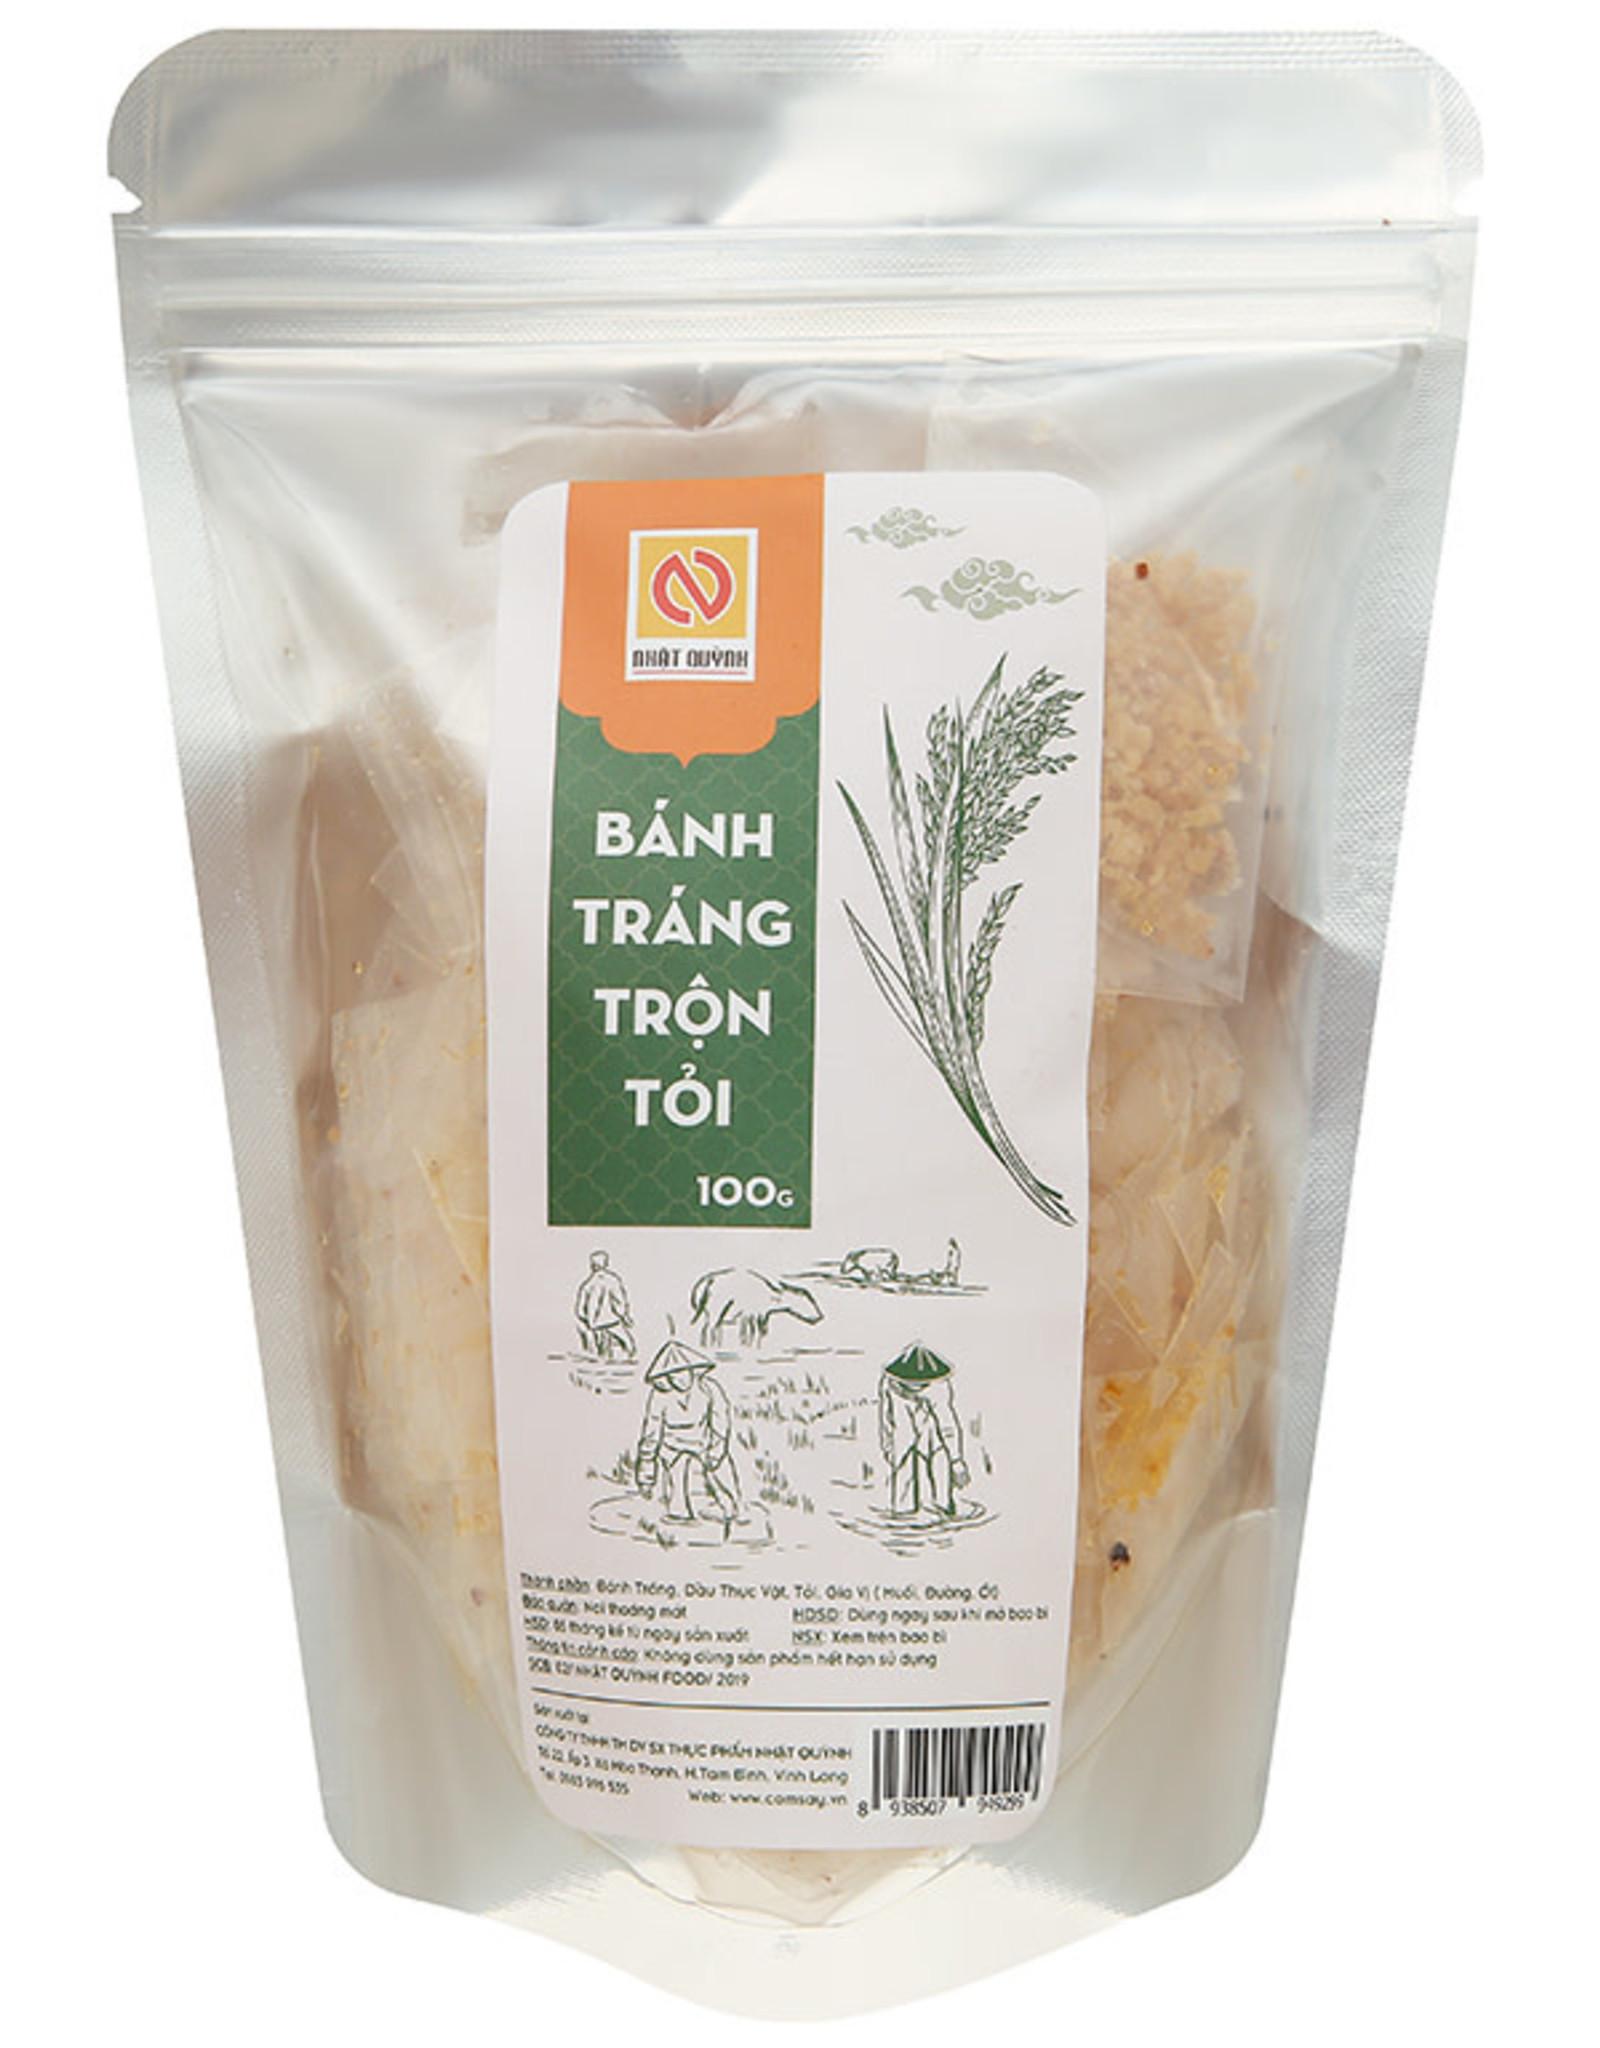 Nhat Quynh Rice paper Mix Garlic/ Banh Trang Tron 100g